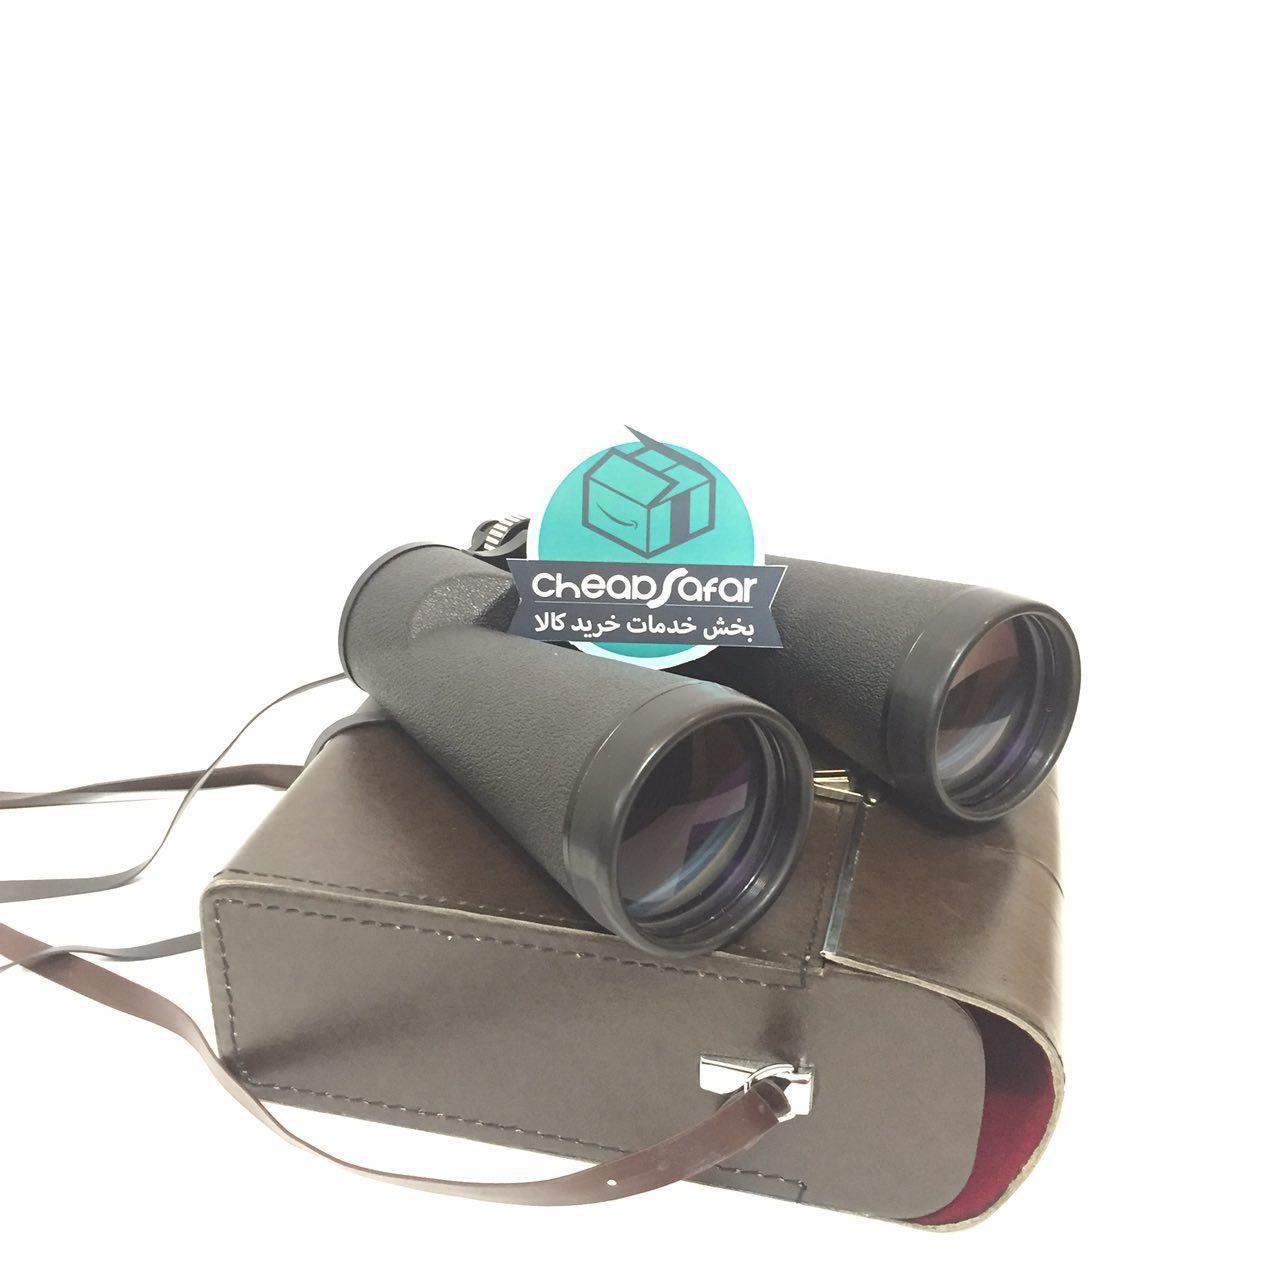 Selsi Binoculars 30 X 70 Light Weight Fully Coated